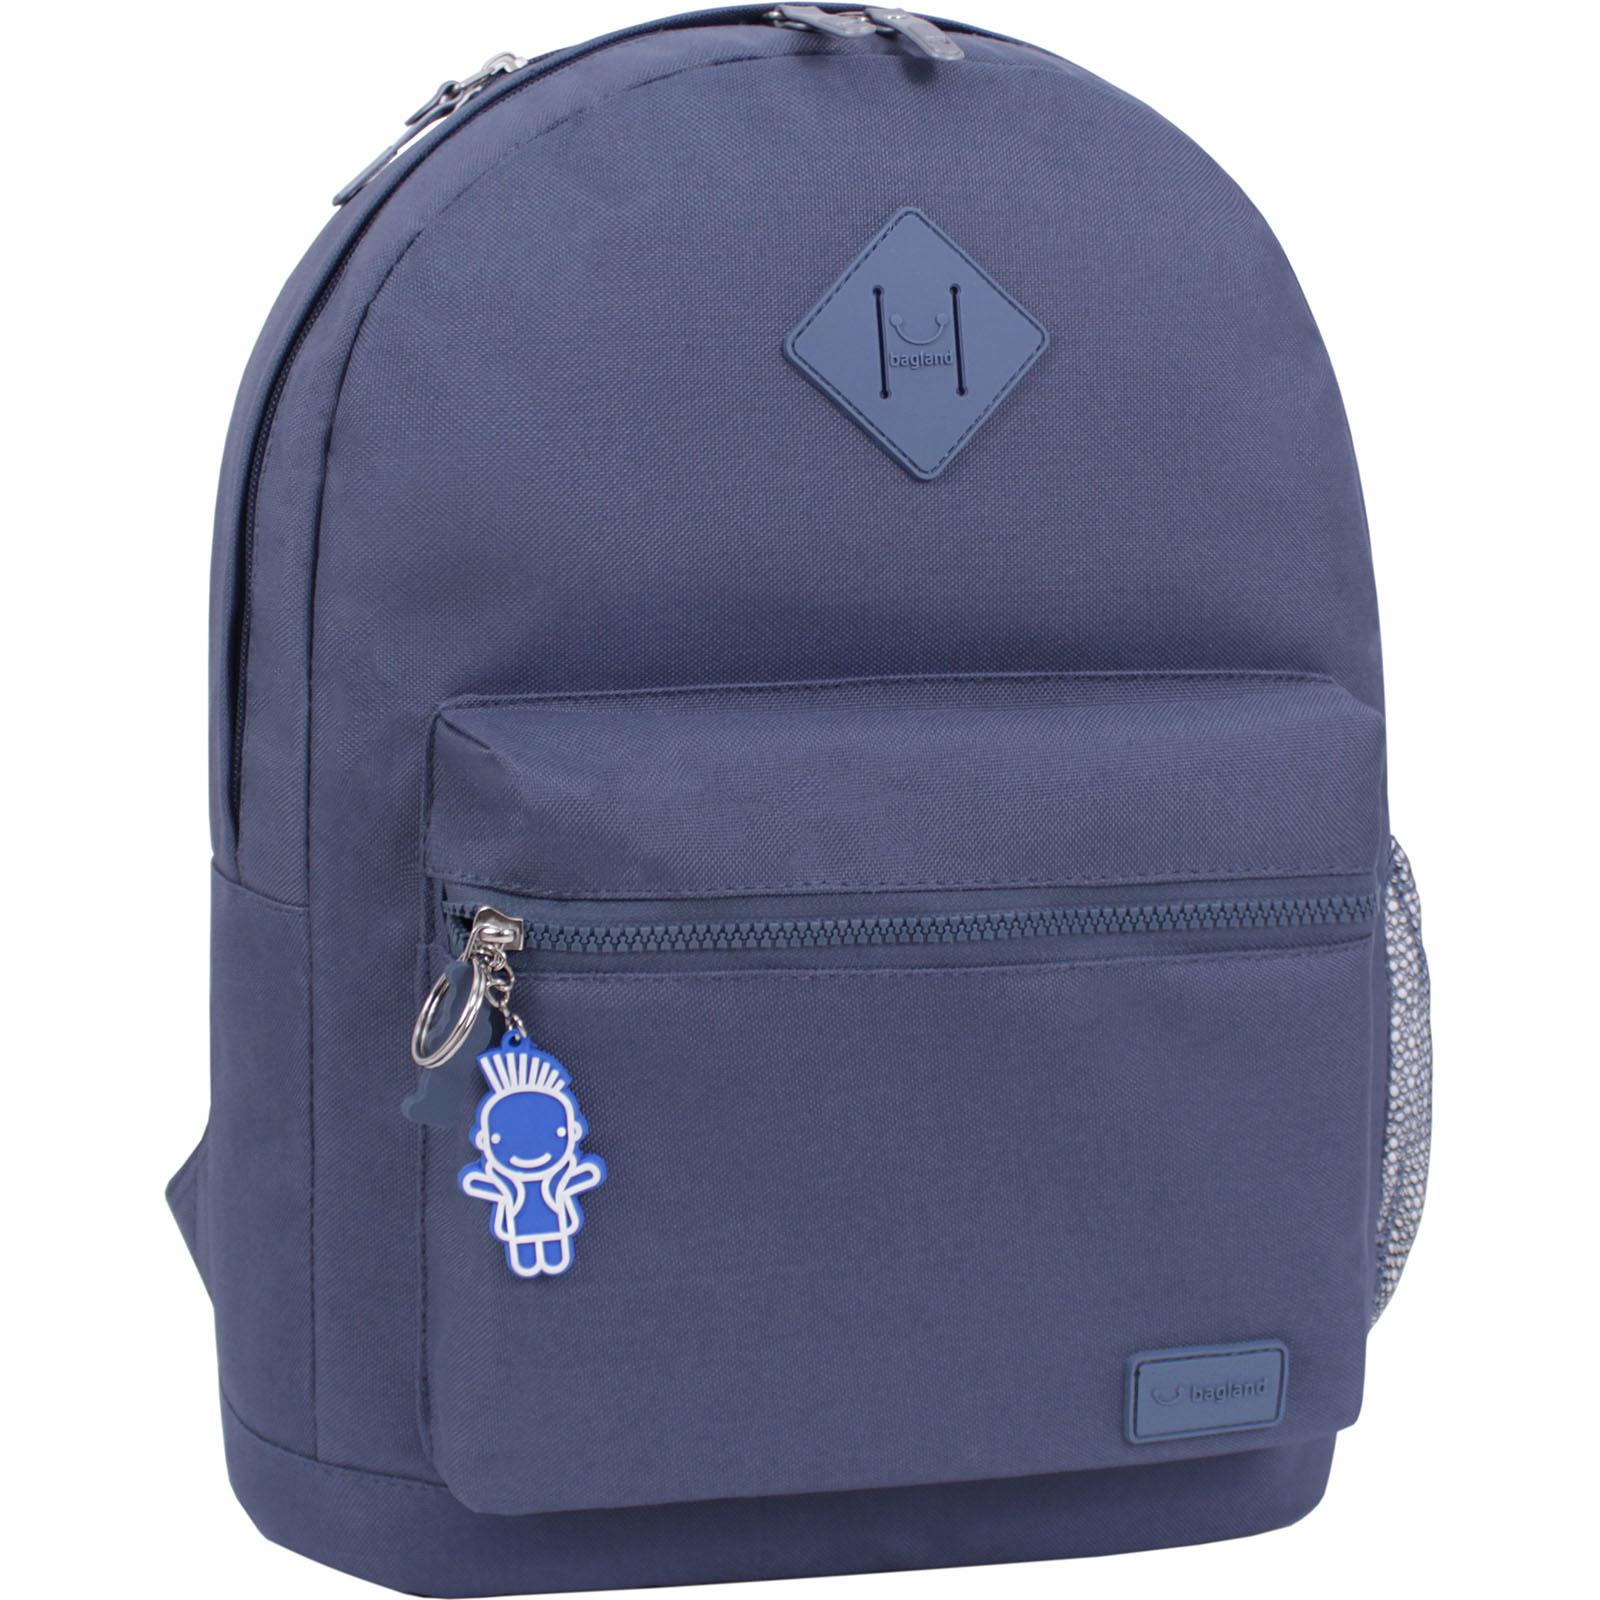 Городские рюкзаки Рюкзак Bagland Hood W/R 17 л. серый 458 (0054466) IMG_6178_суб.458_.JPG